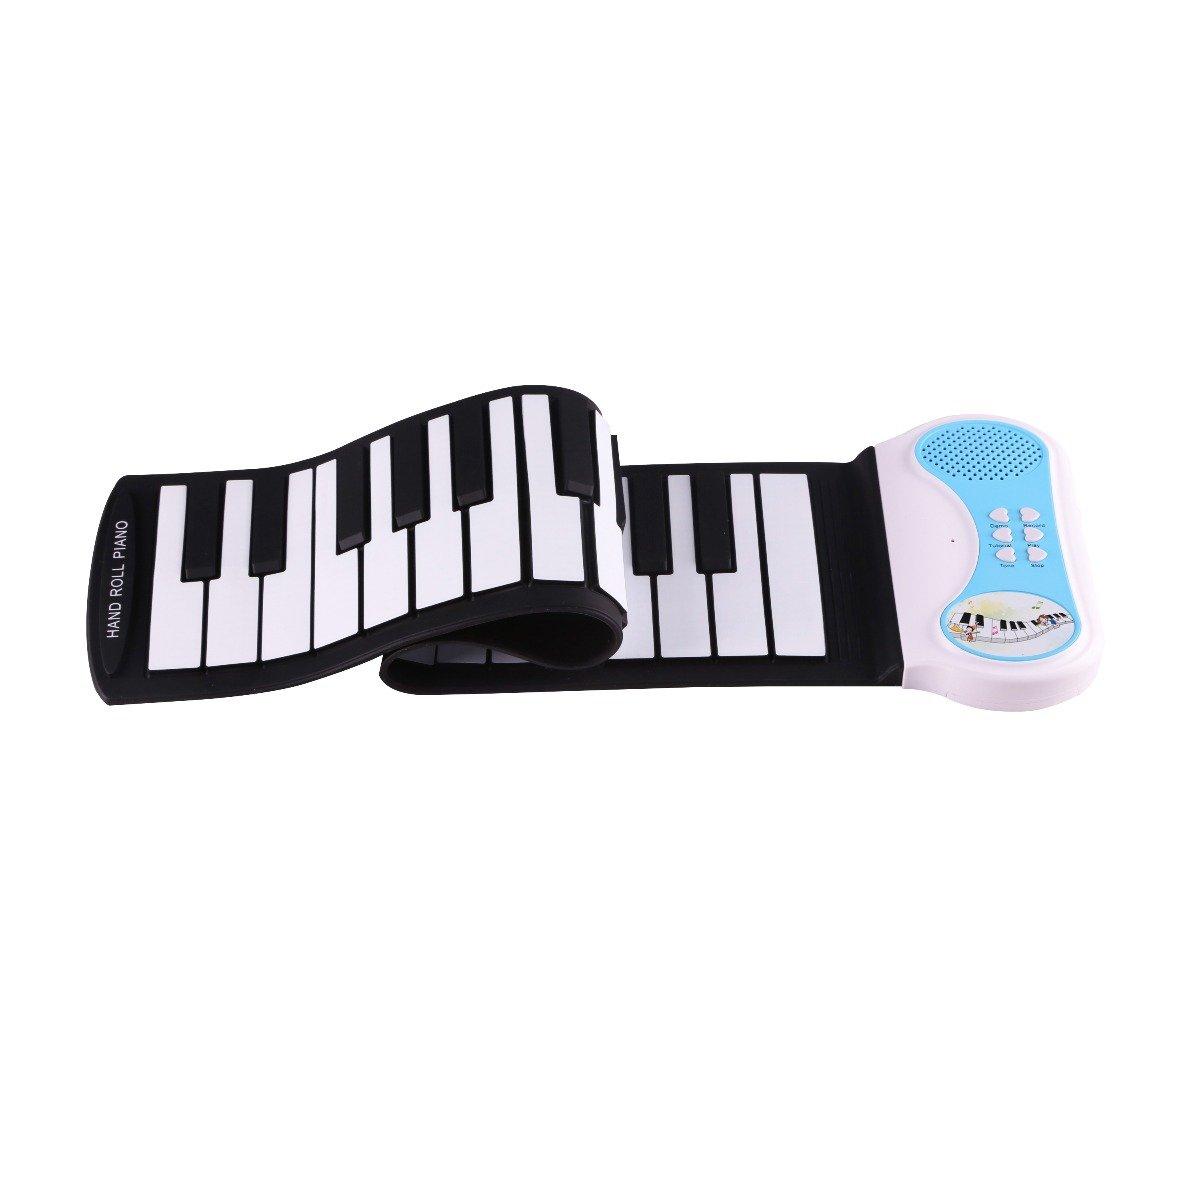 Pianina Flexibila Pentru Copii Tip Roll-up Konix, 37 Clape